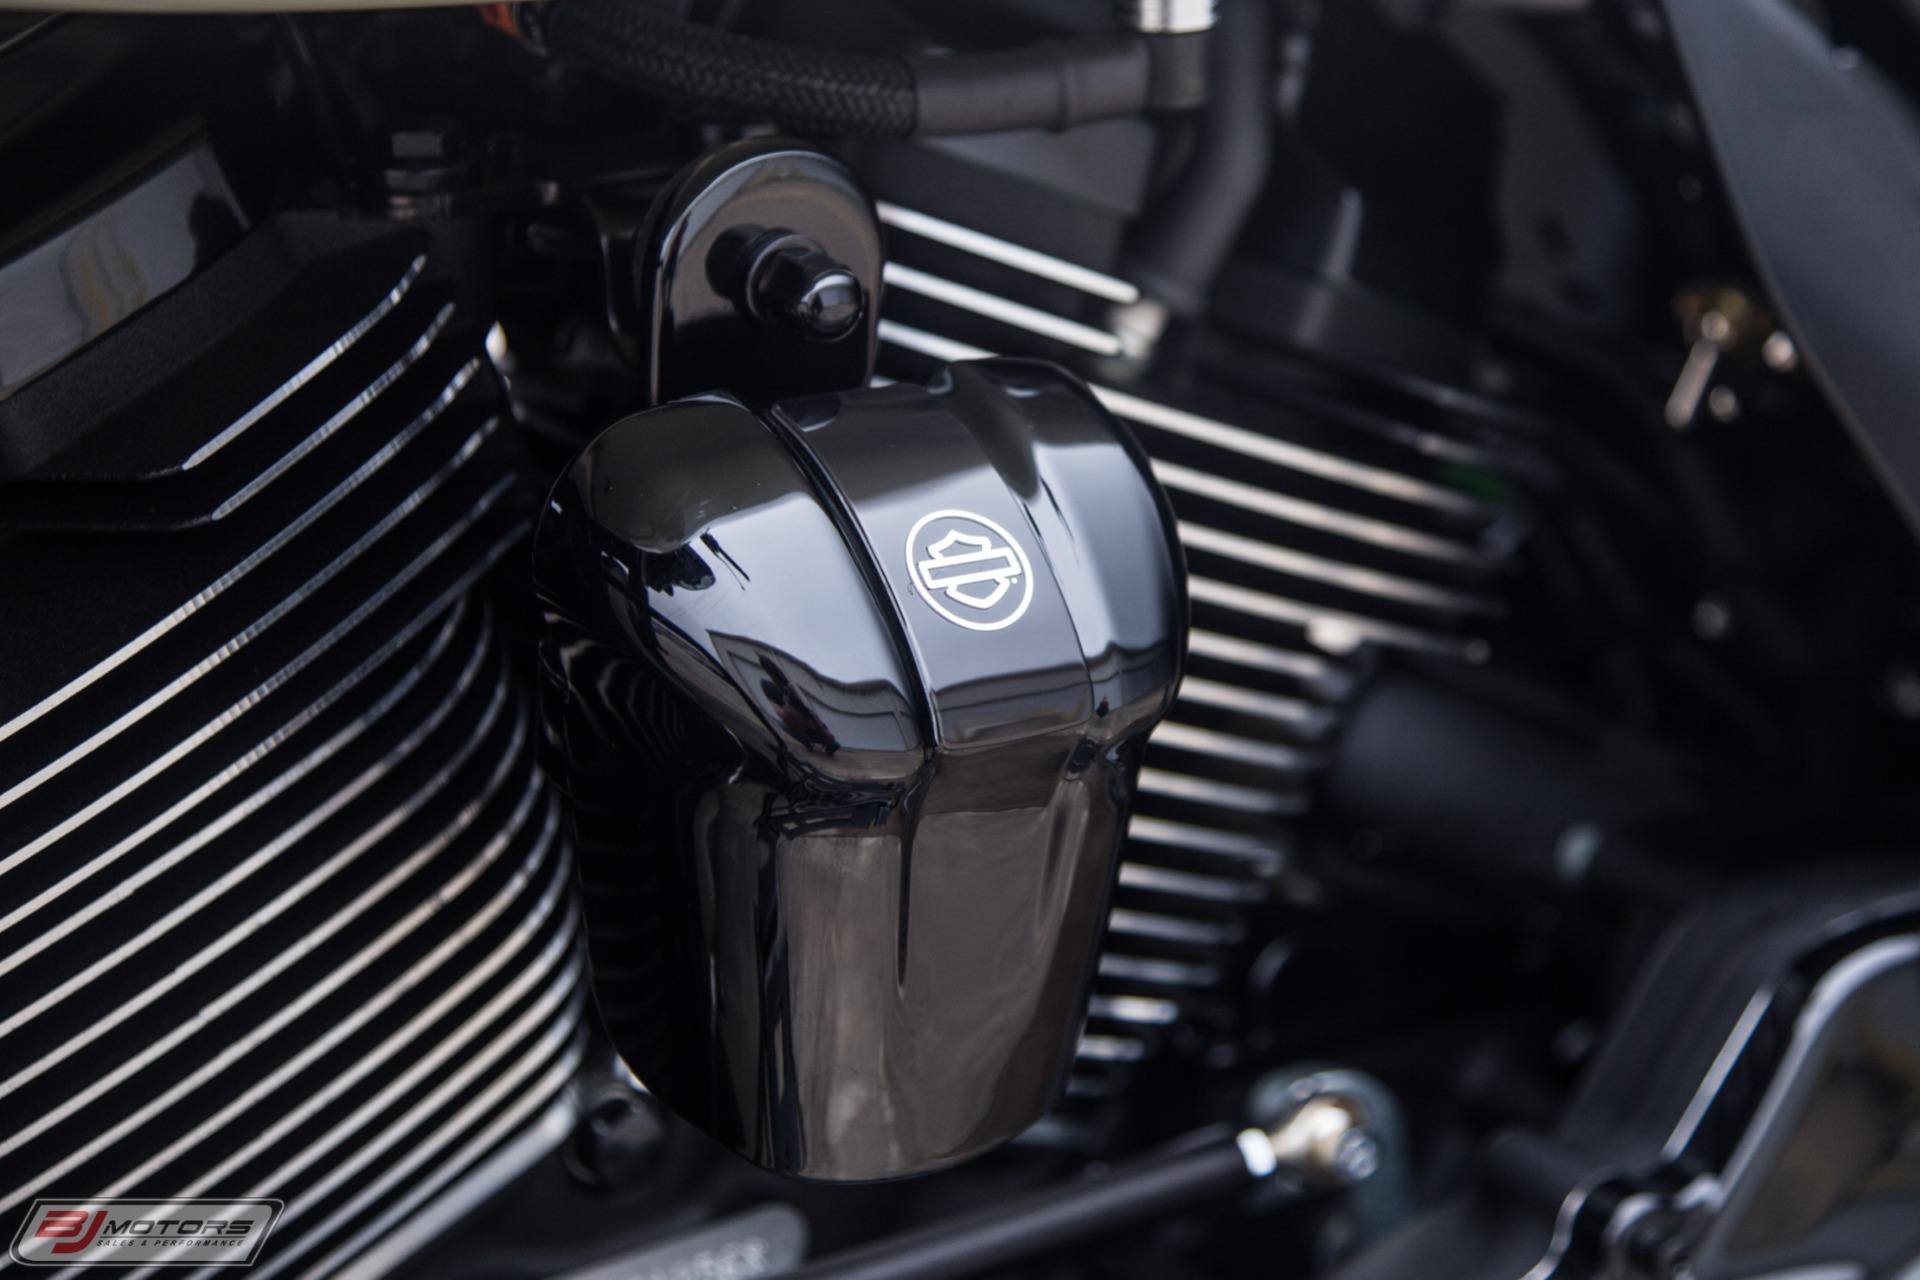 Used-2018-Harley-Davidson-Road-Glide-Custom-Bagger